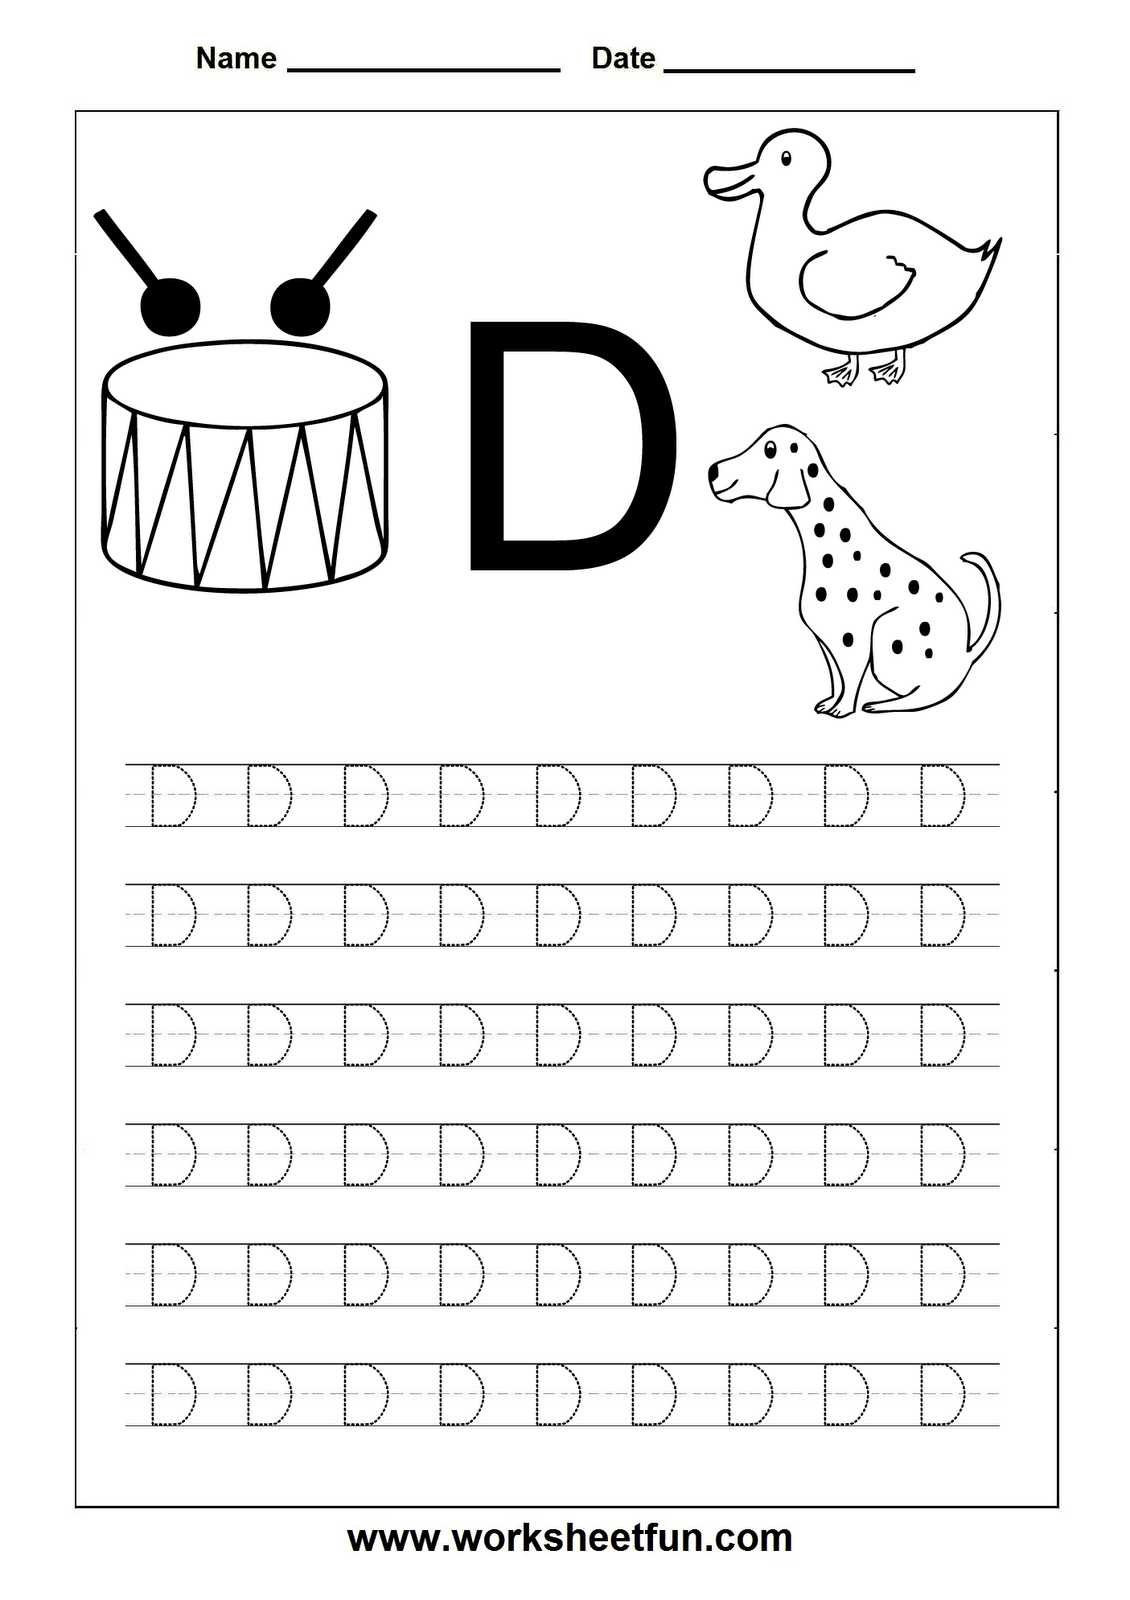 letter d worksheets HD Wallpapers Download Free letter d ...